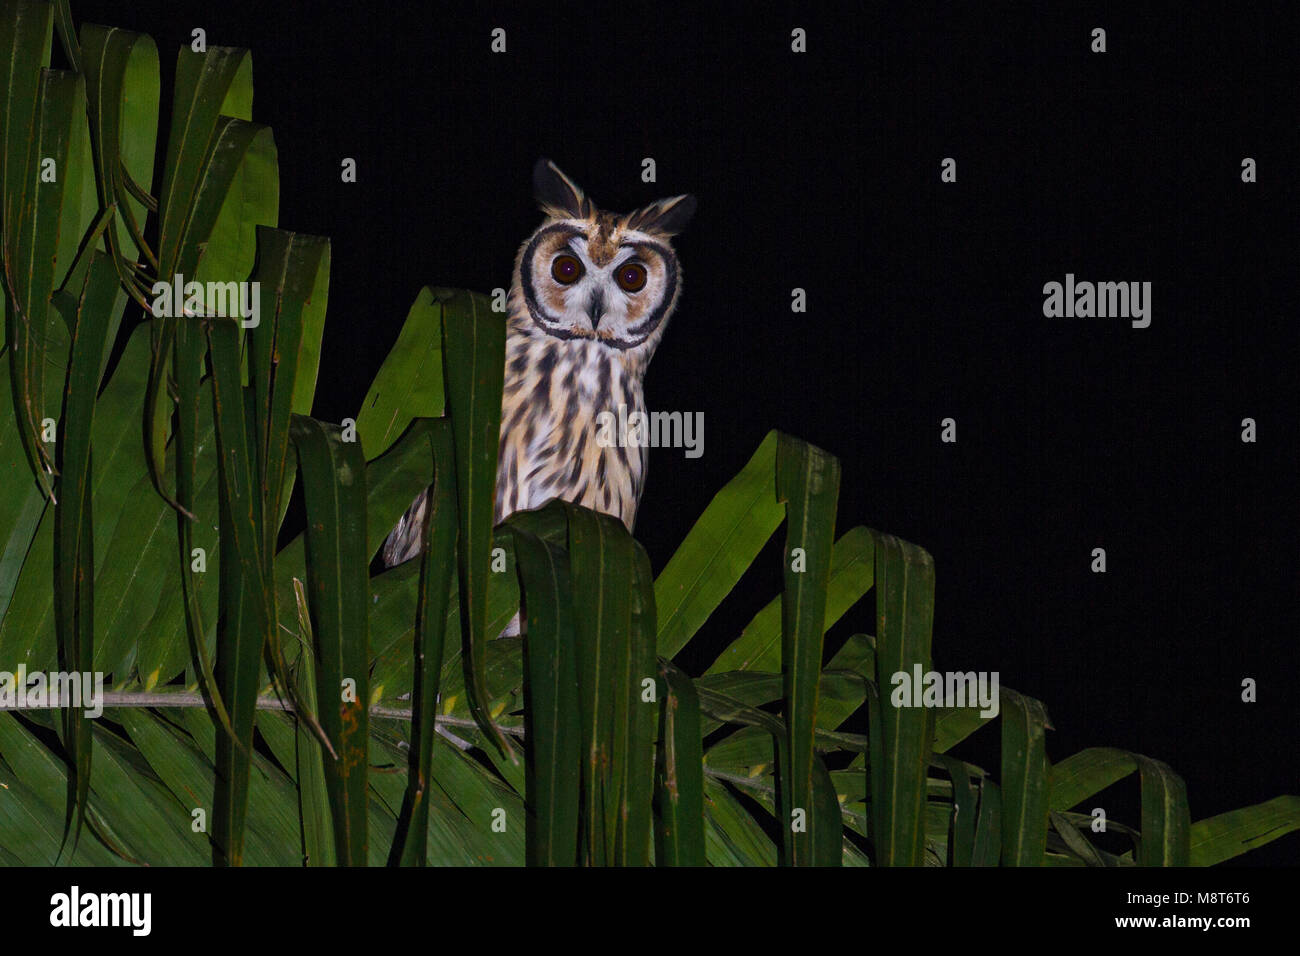 bird photo made by dubi shapiro stock photo 177553158 alamy